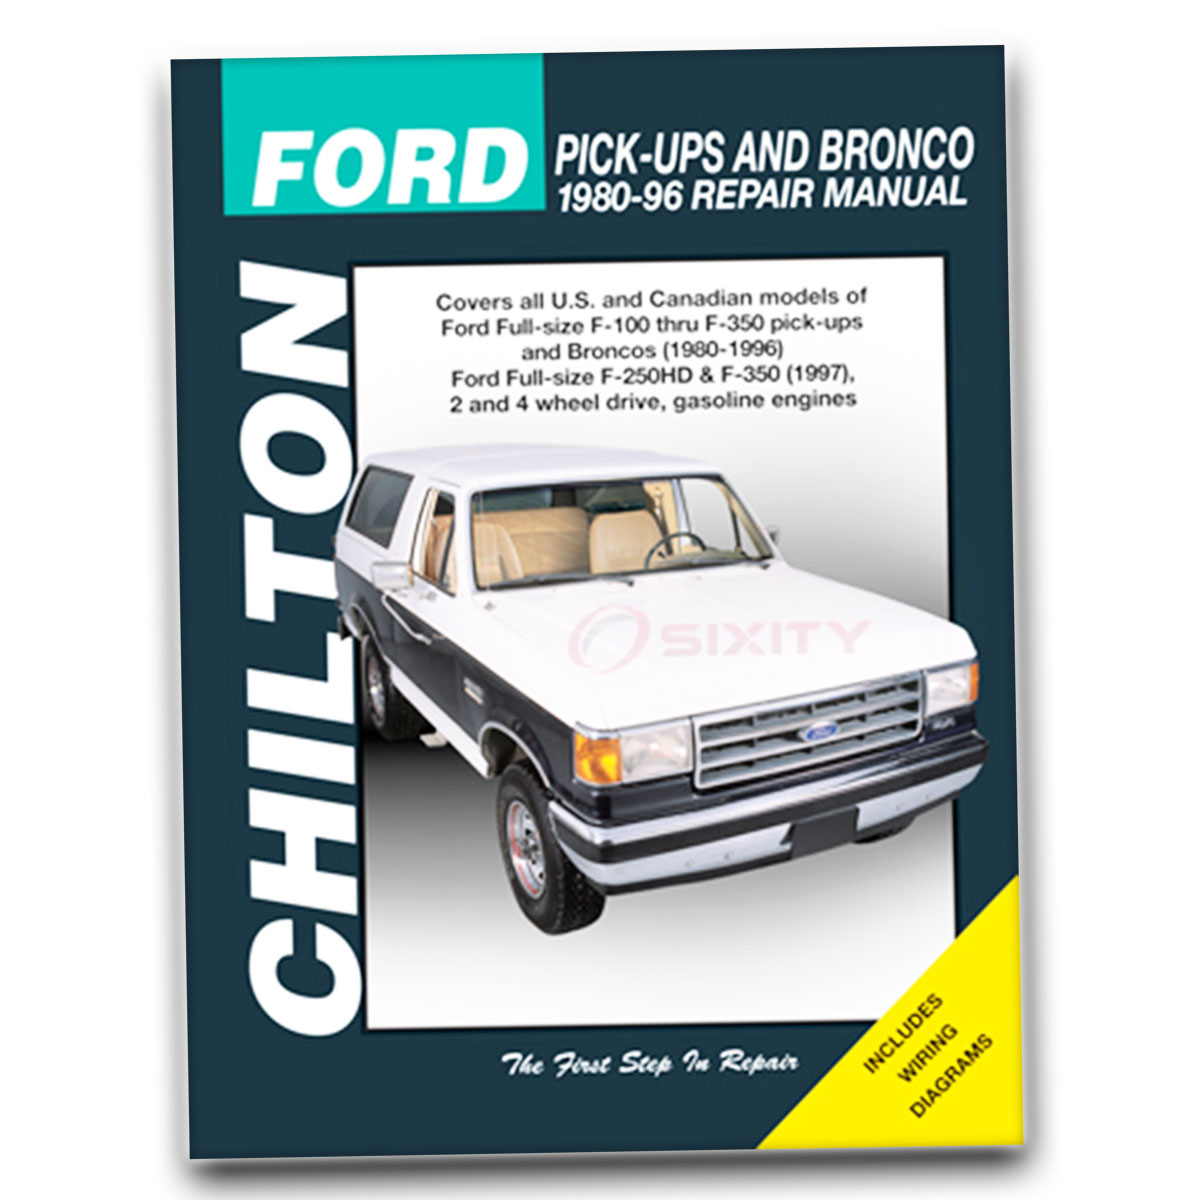 Chilton Repair Manual 26664 for Ford Pick-Ups Bronco 1987-96 Shop Service wl